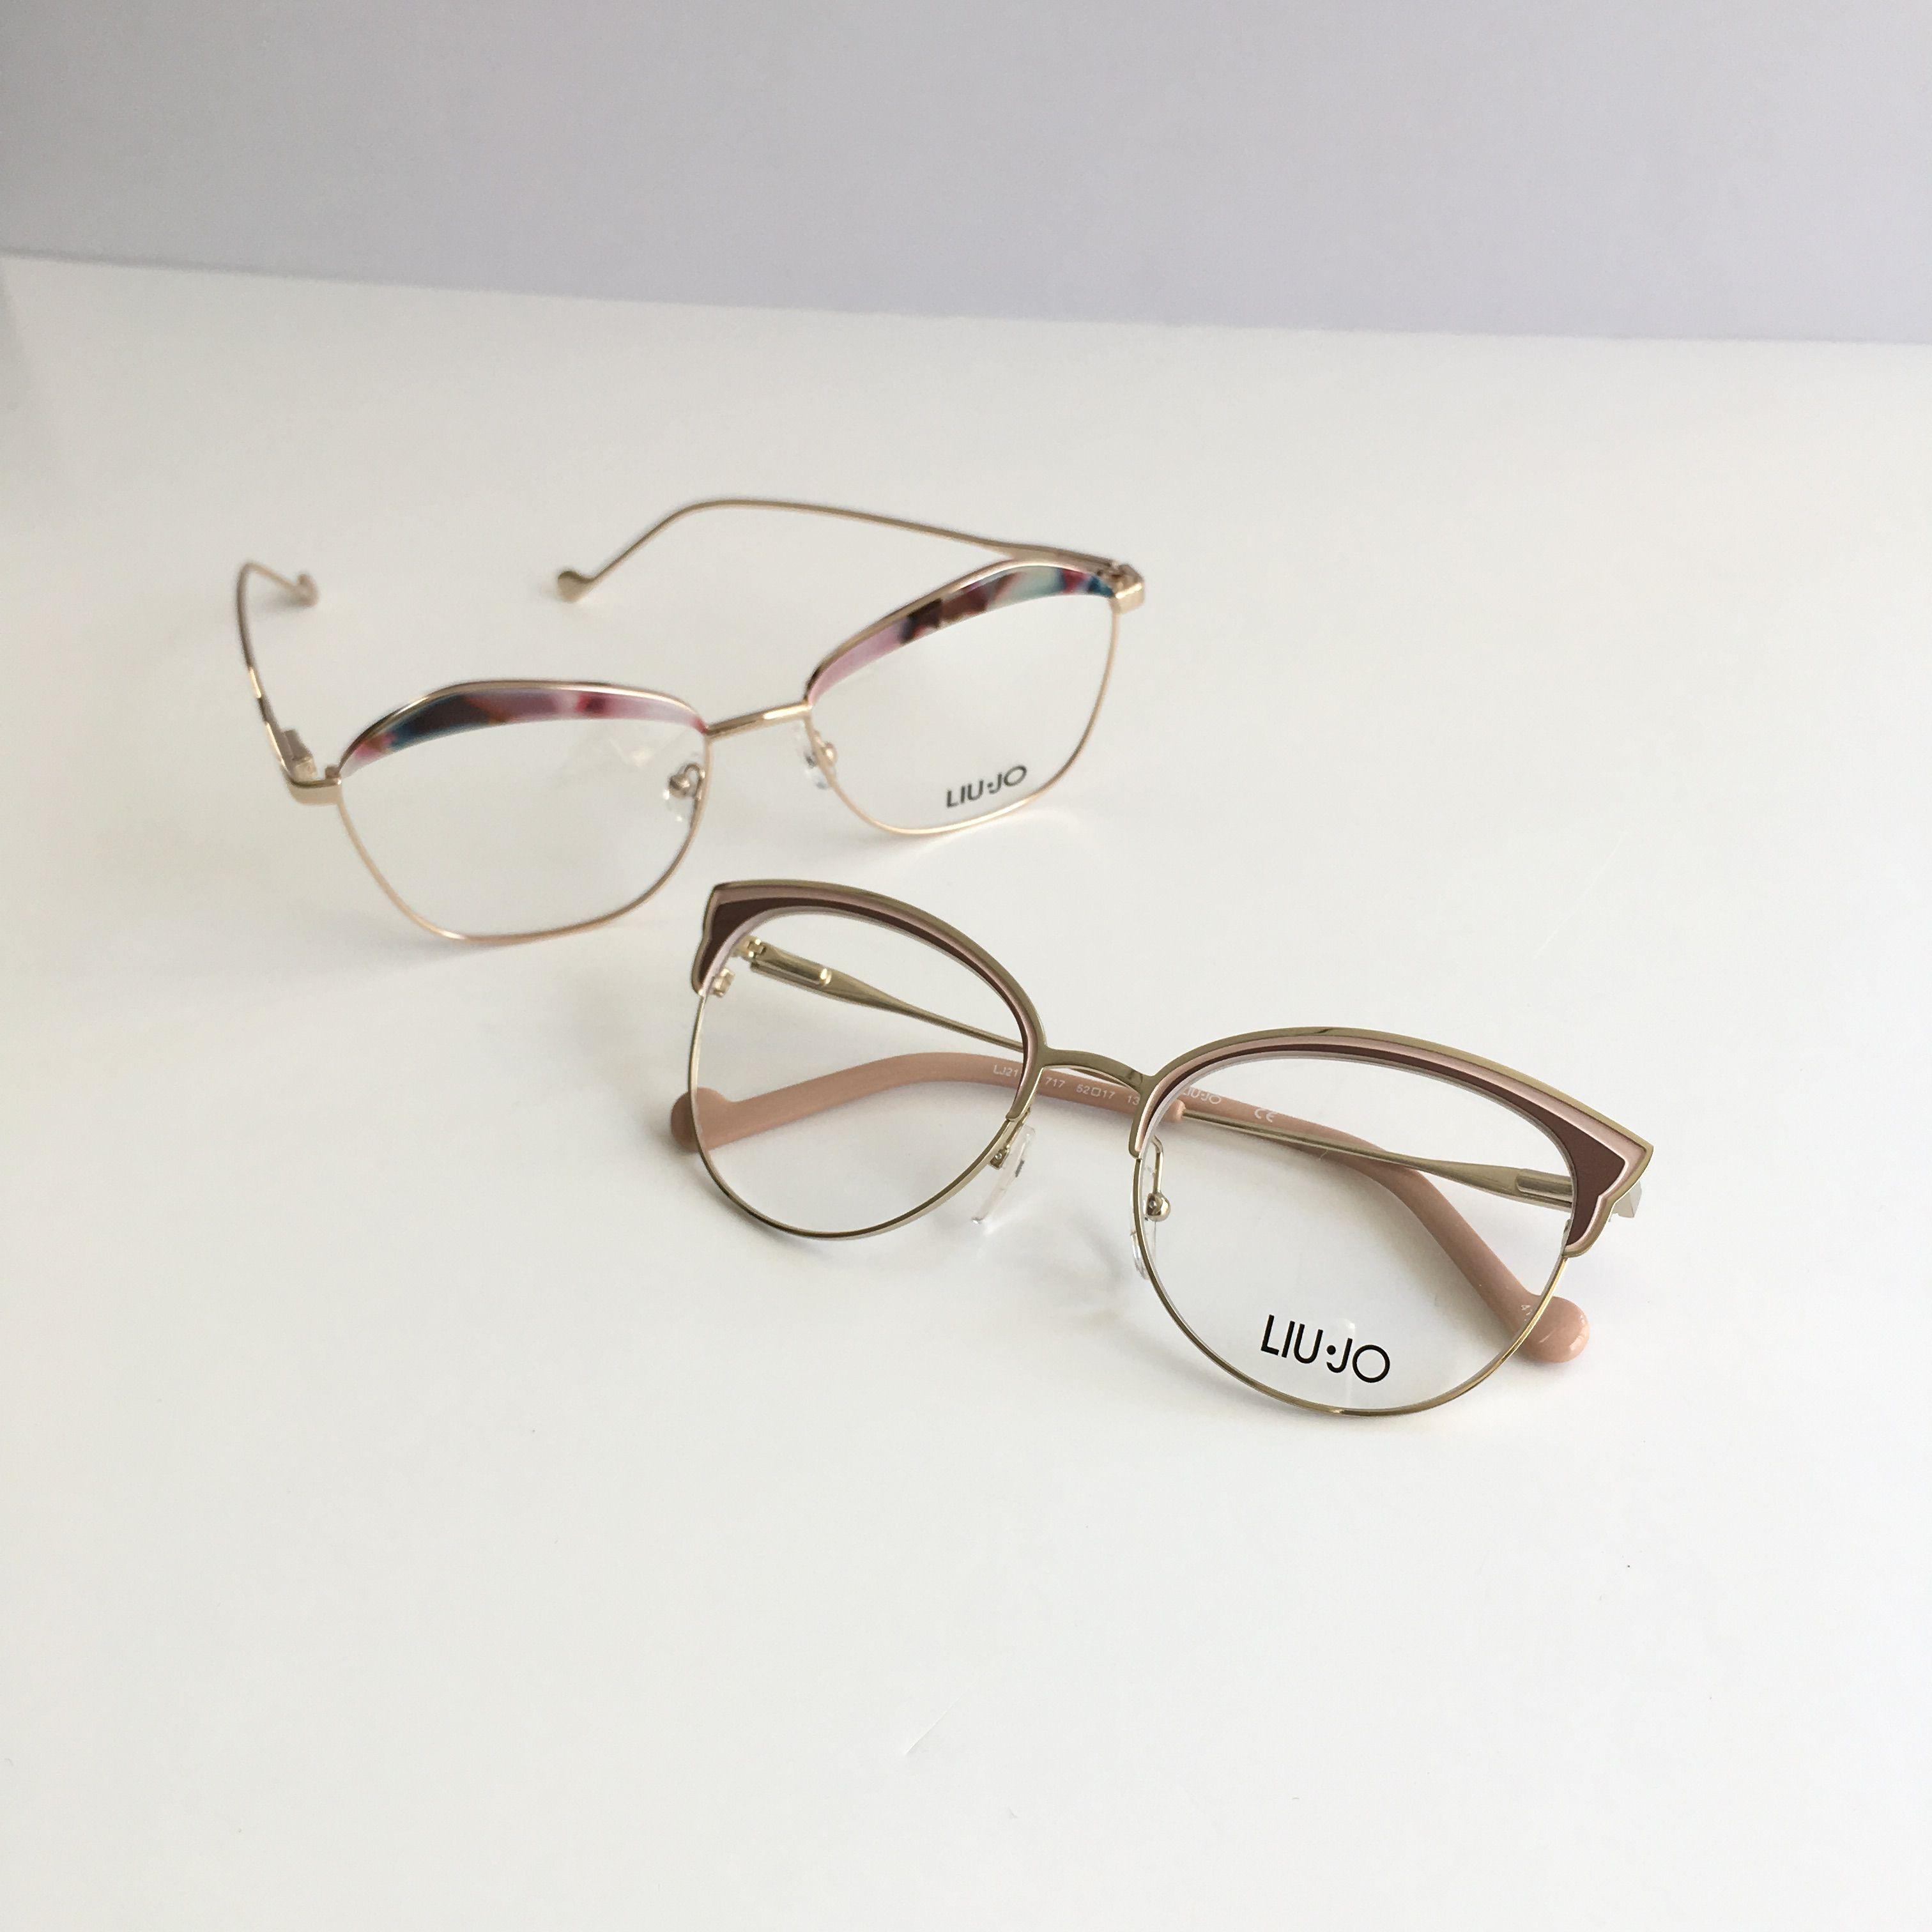 contar Lidiar con Decepcionado  Liu Jo - Find the Liu Jo eyewear collection on www.eyecatchonlin ...